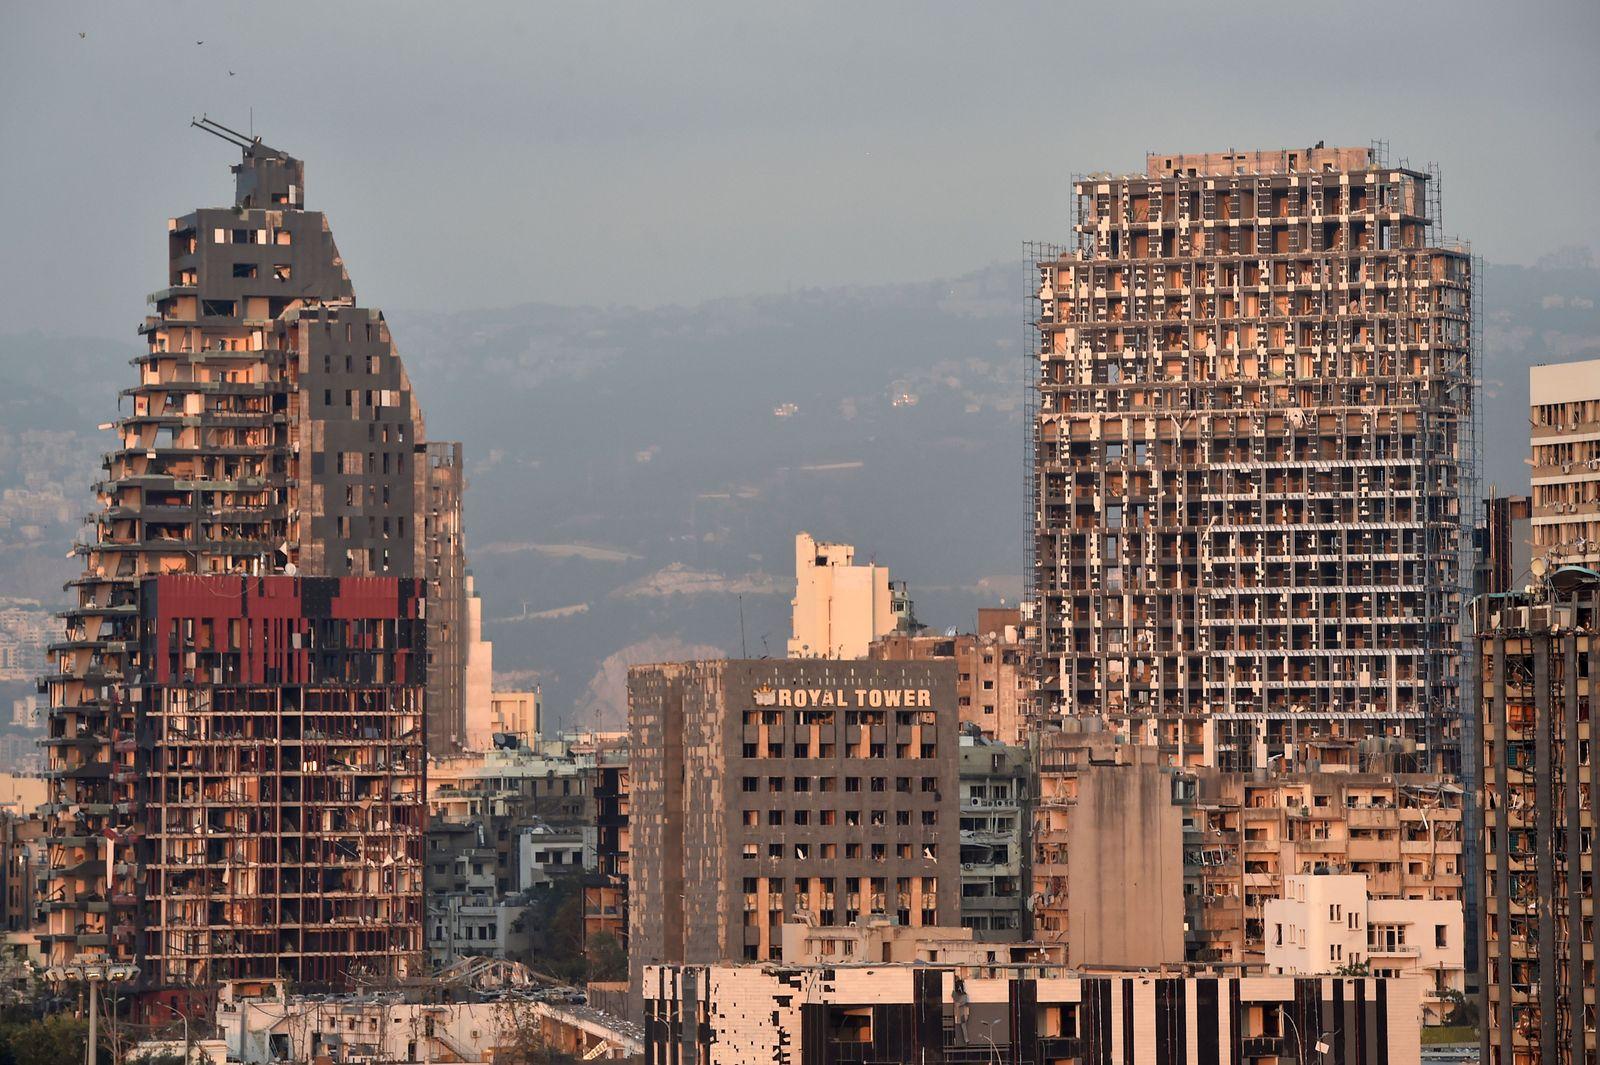 Large explosion in harbor area rocks Lebanon, Nbeirut - 04 Aug 2020